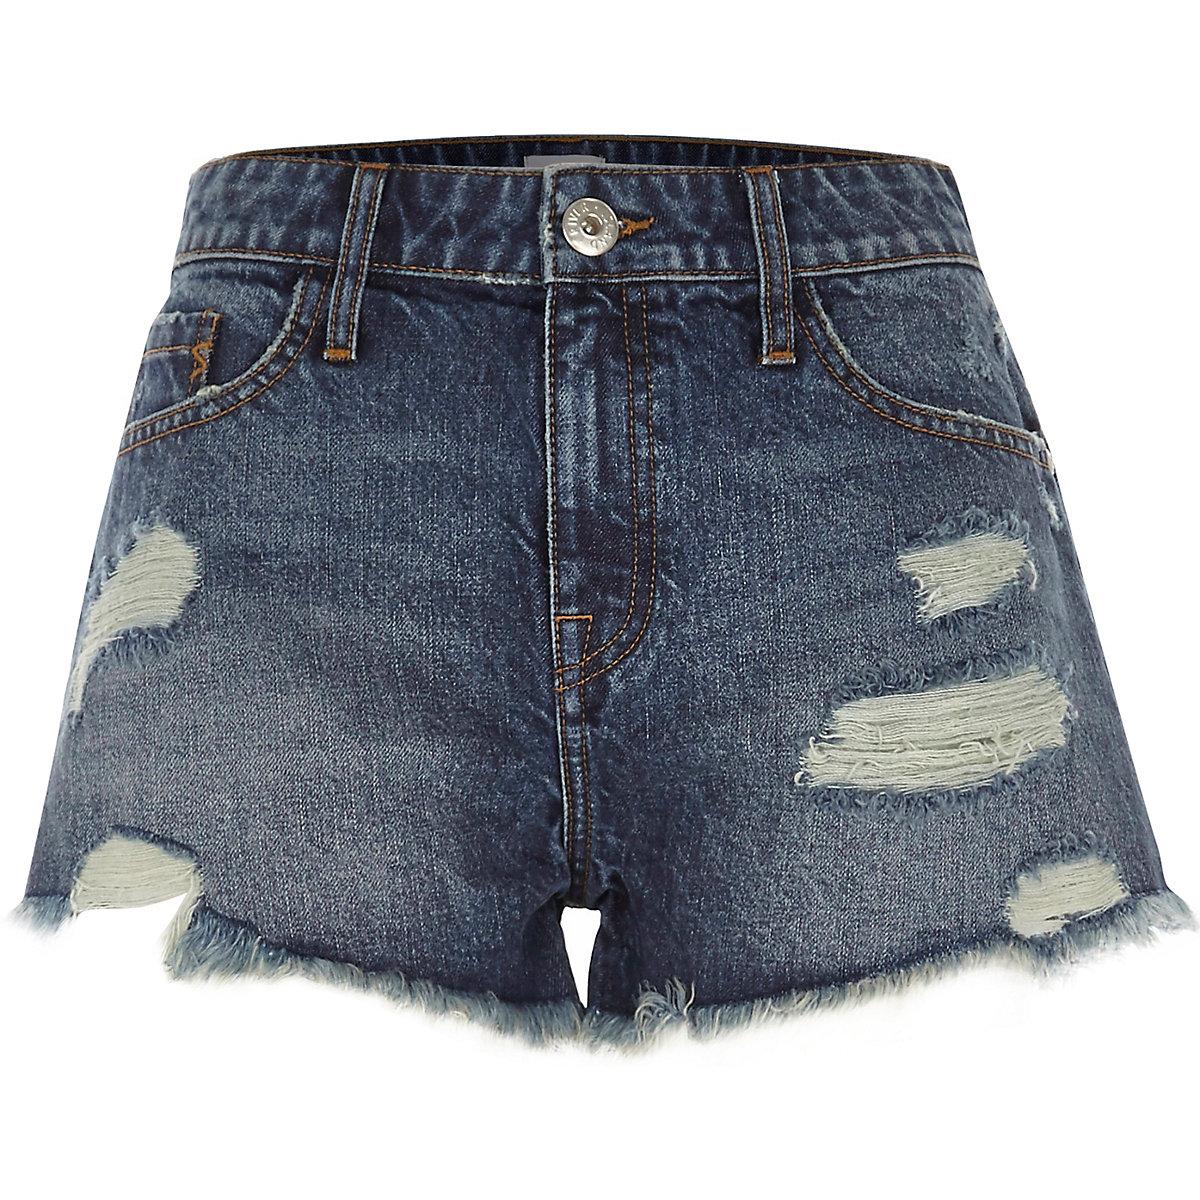 a9bbf6ac82883 Femme Bleu Déchiré Short Moyen Jean En Shorts Promos 7qHwB0